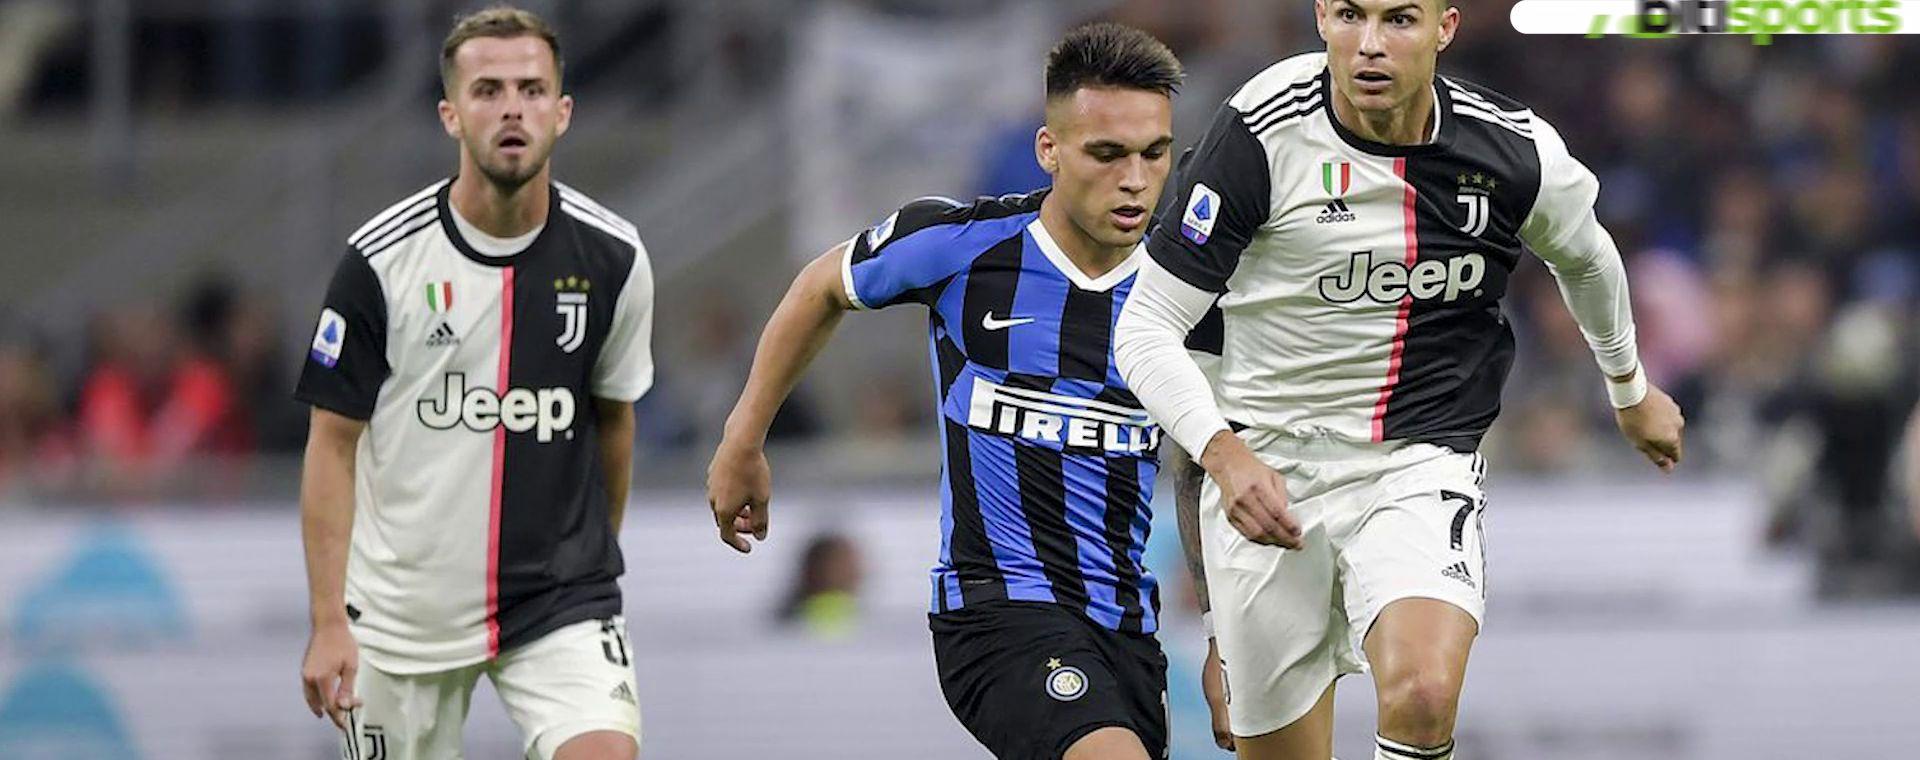 Juventus without Bonucci